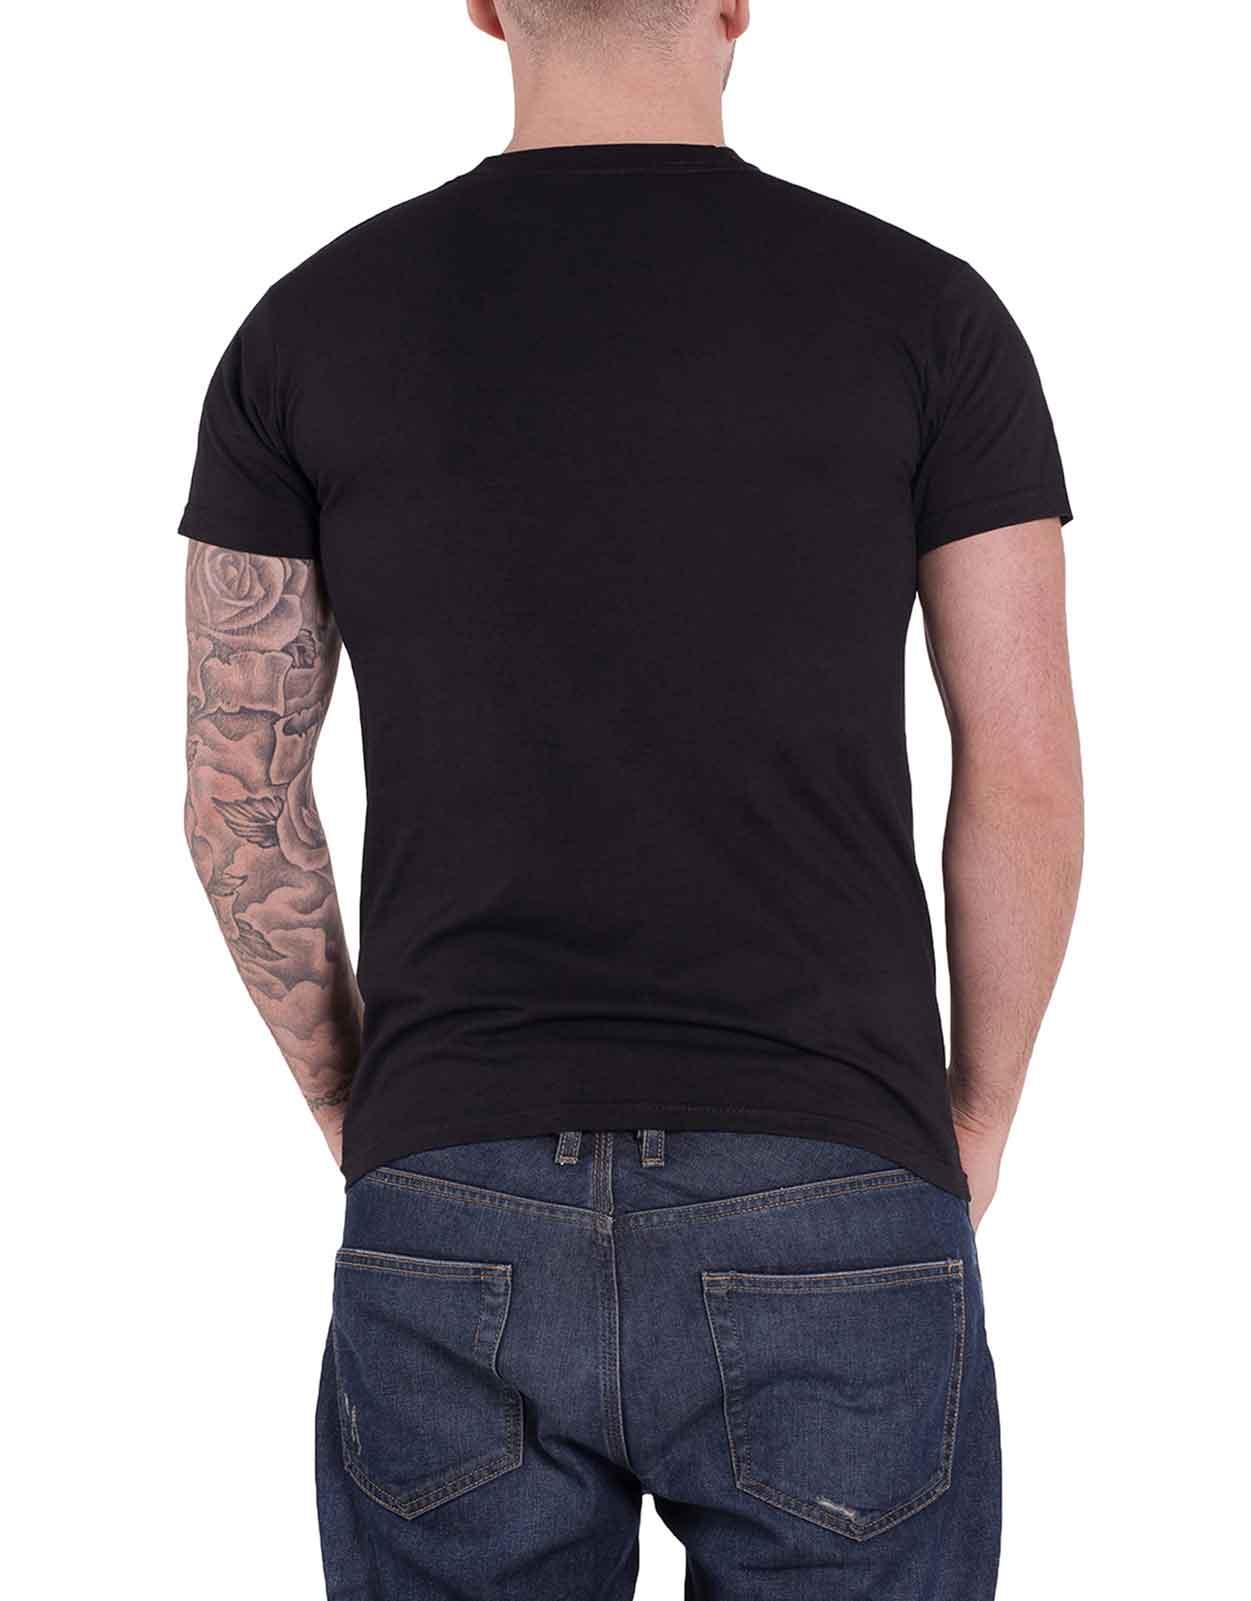 Official-Motley-Crue-T-Shirt-Shout-at-the-Devil-The-Dirt-Tour-Band-Logo-Mens thumbnail 7